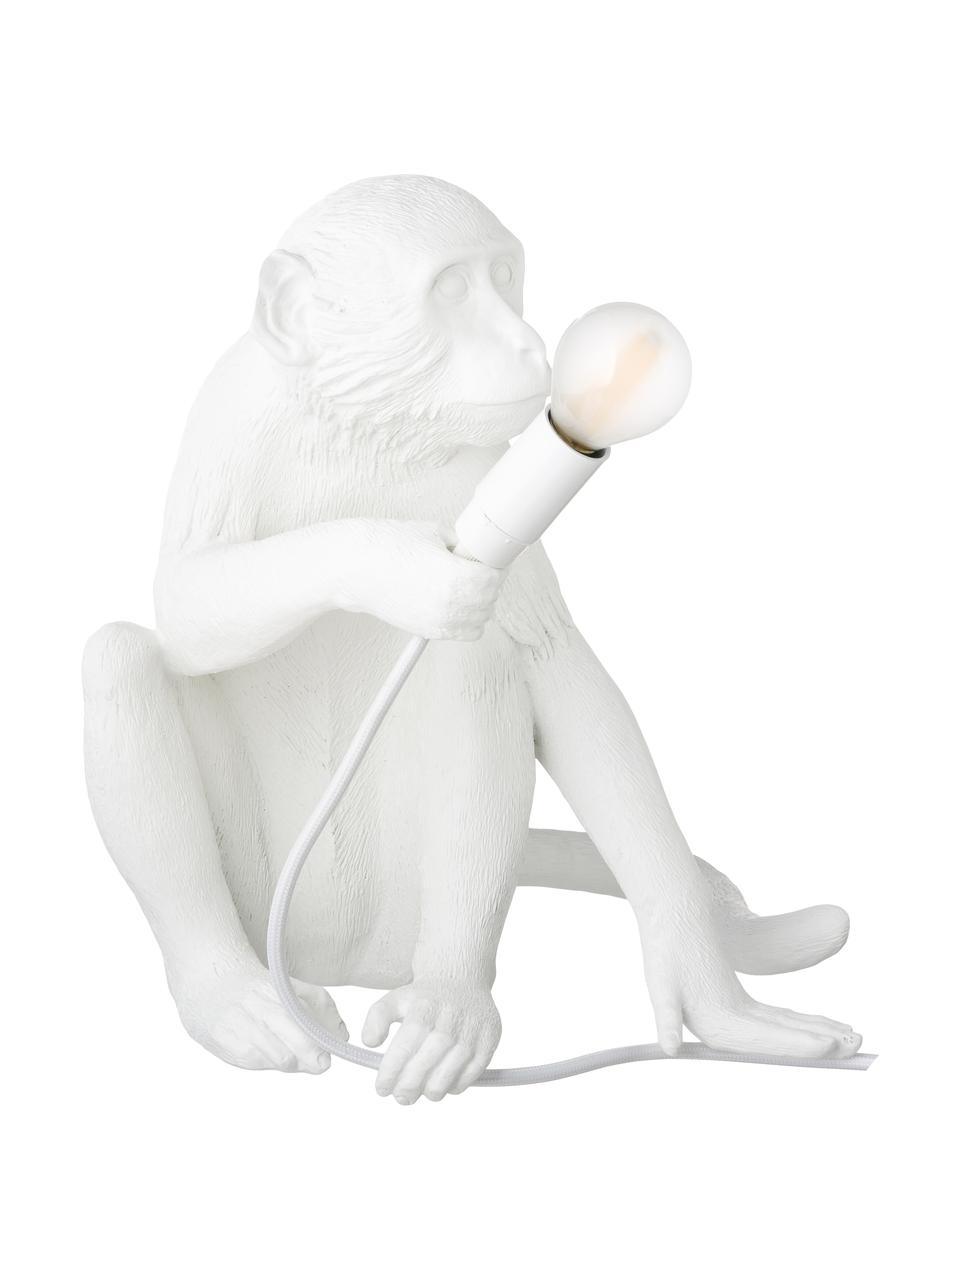 Lampada da tavolo di design Monkey, Lampada: resina sintetica, Bianco, Larg. 34 x Alt. 32 cm